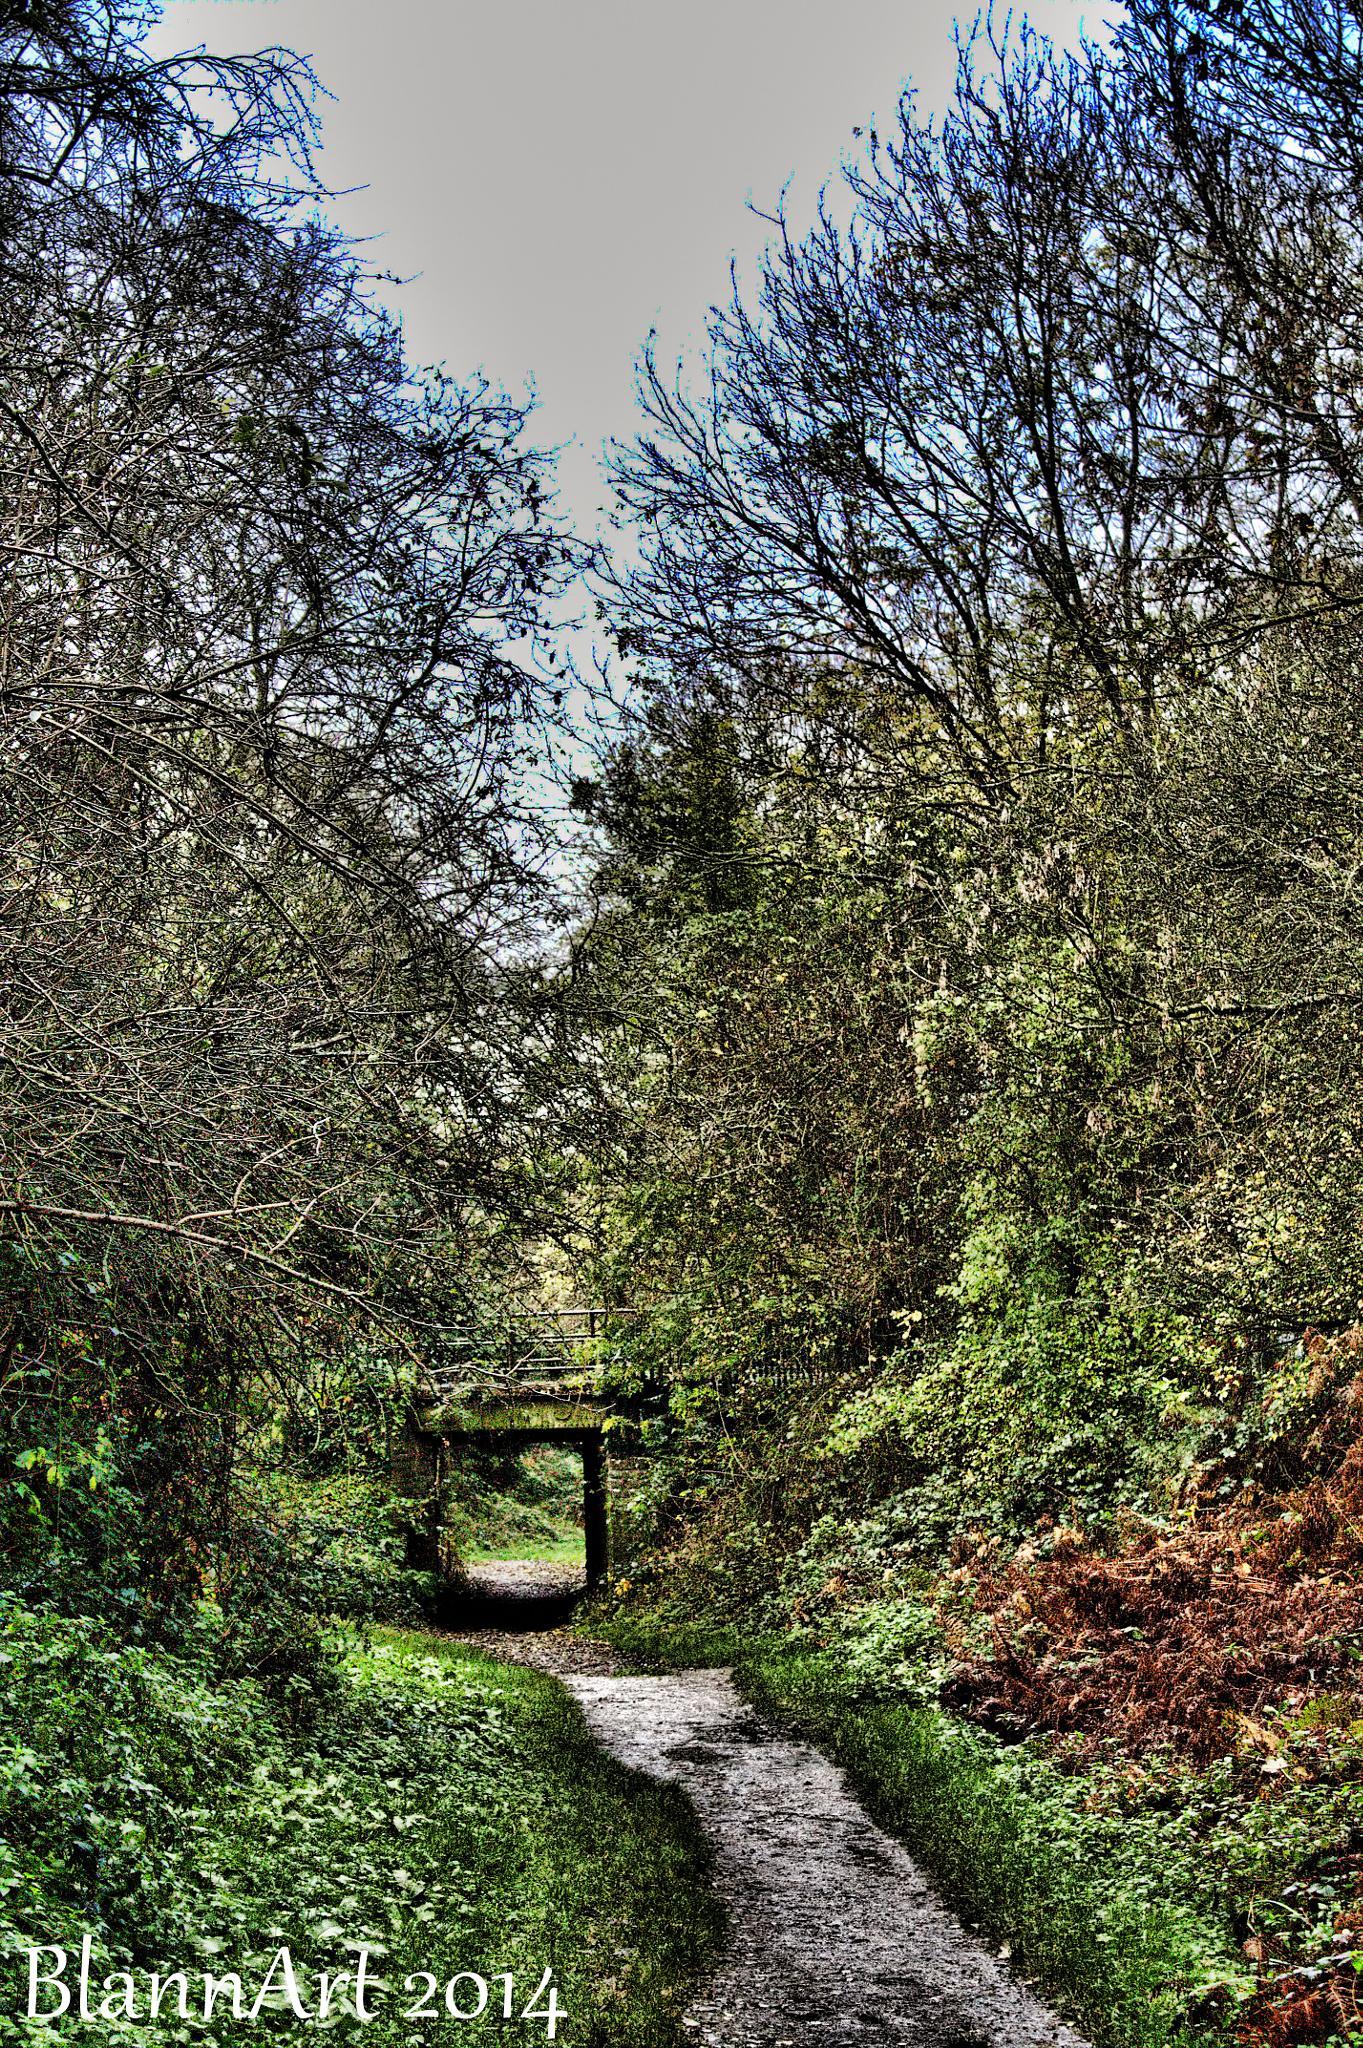 A well trodden path by Phil Blann